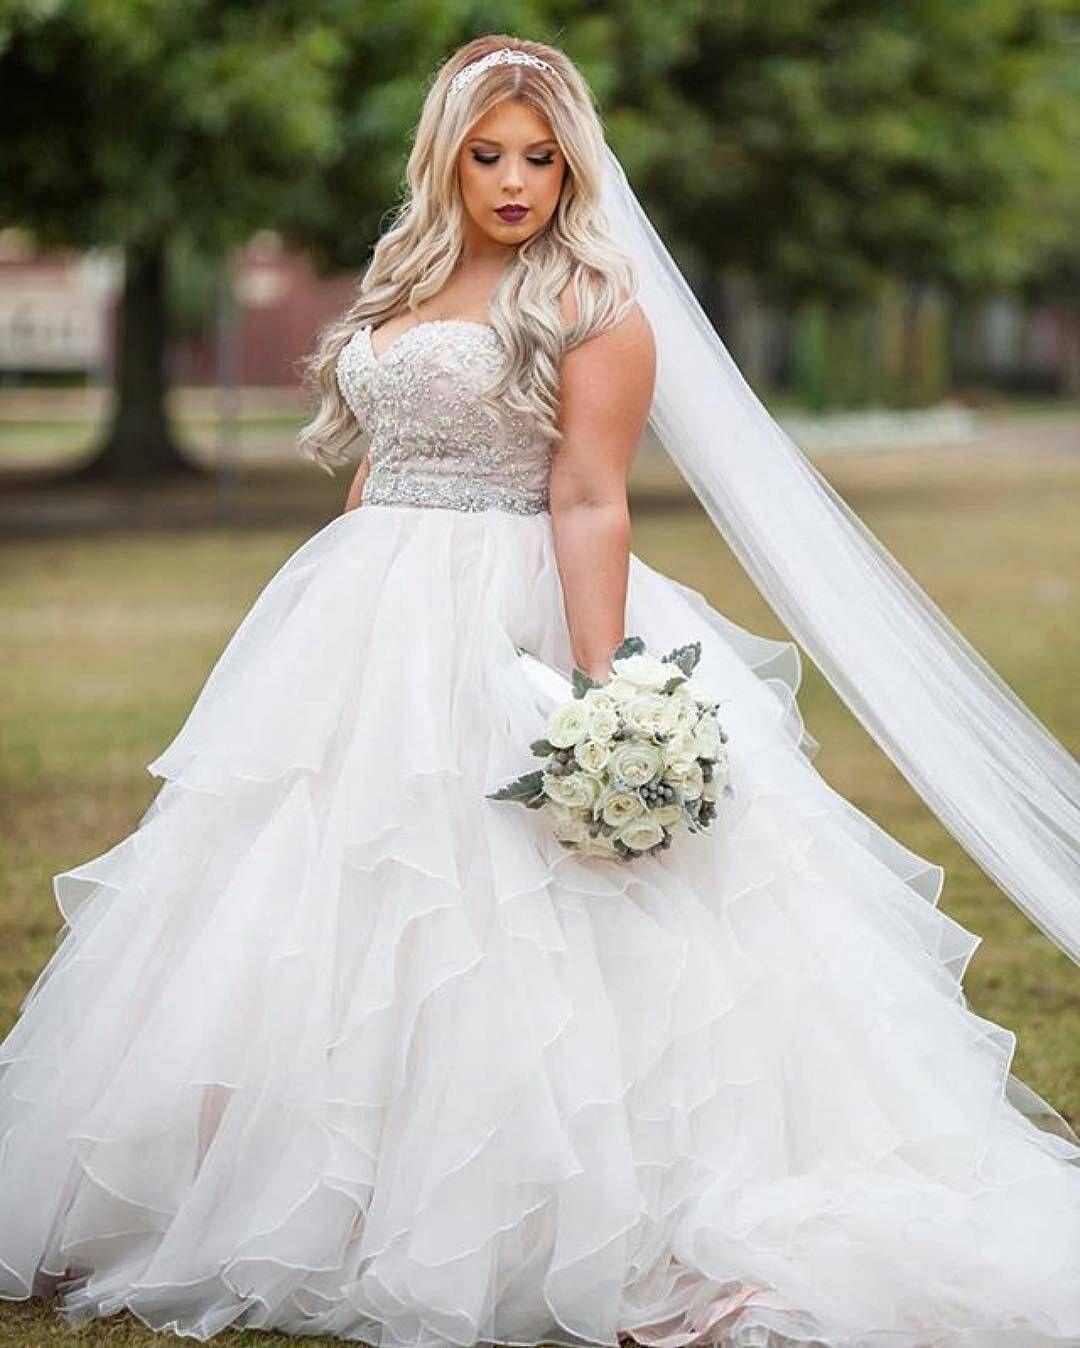 Design your own wedding dress near me  Custom Plus Size Wedding Dresses by Darius Bridal  Dressmaker